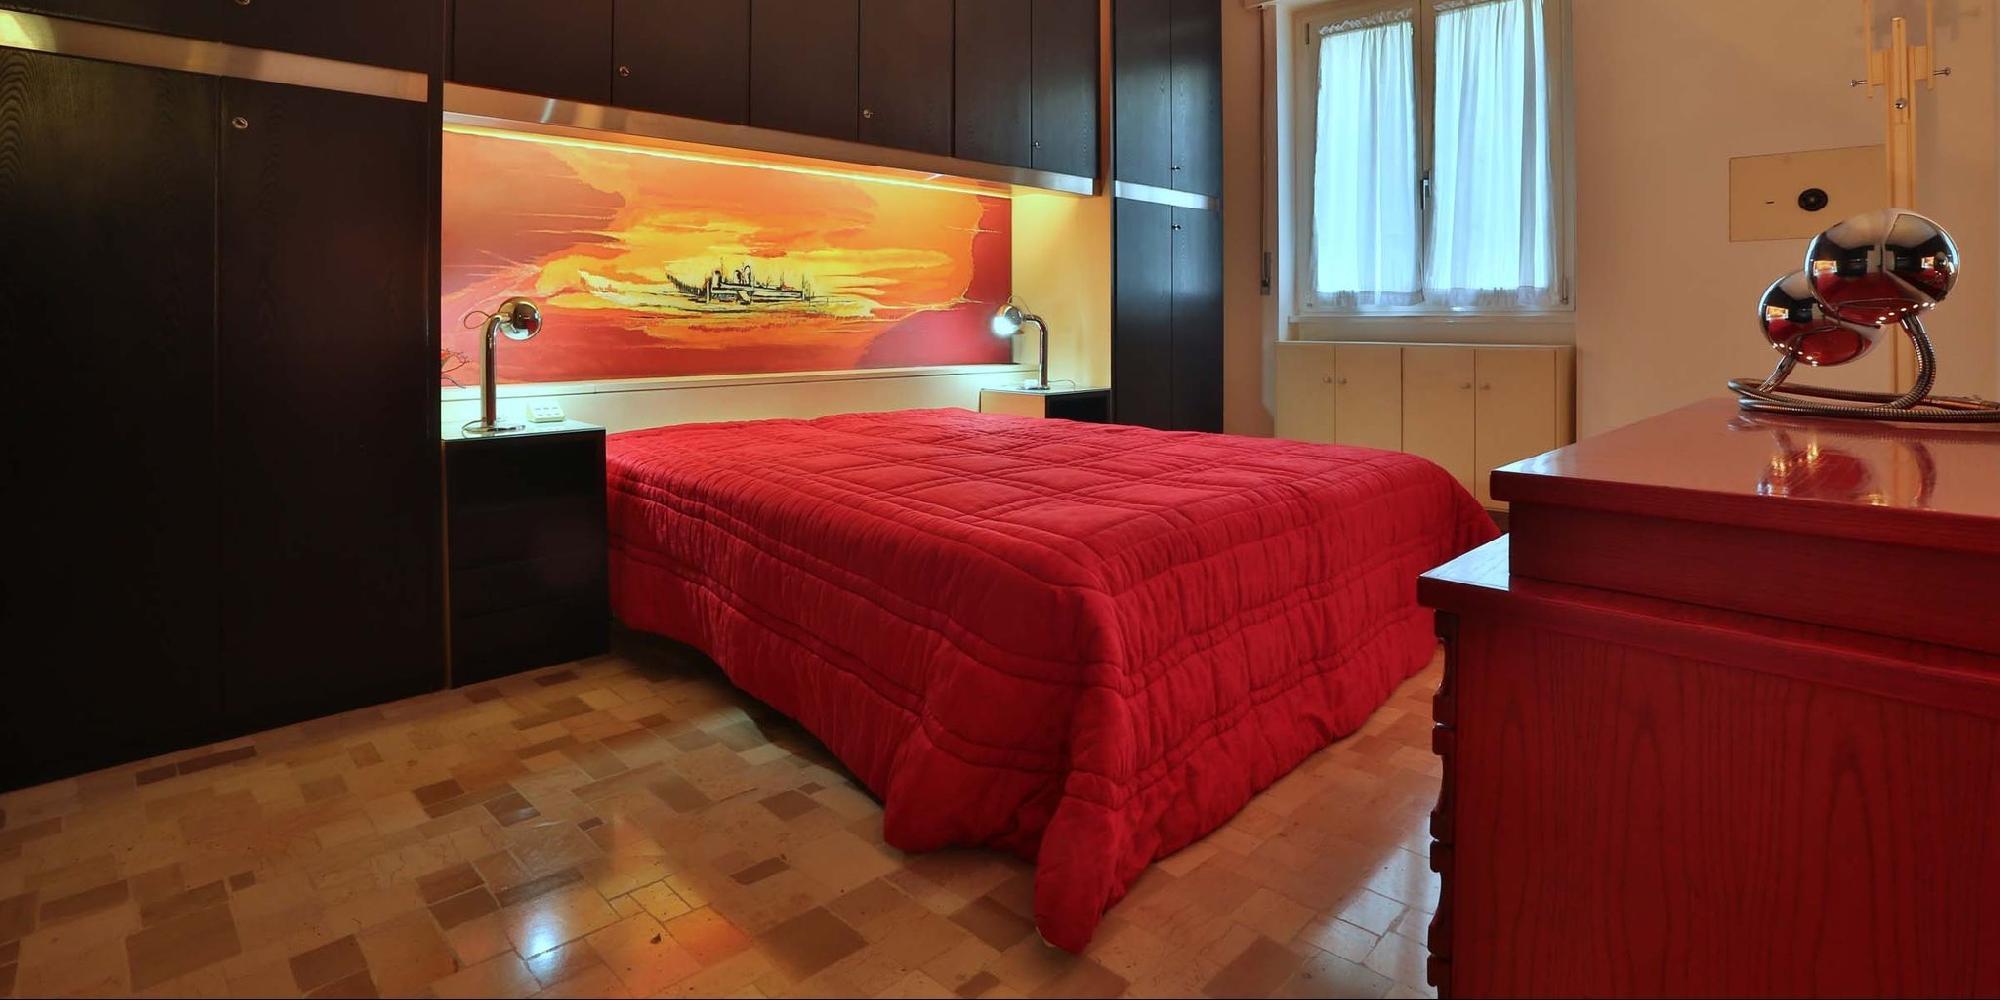 Milan - Charming Ferrante Aporti 2BR